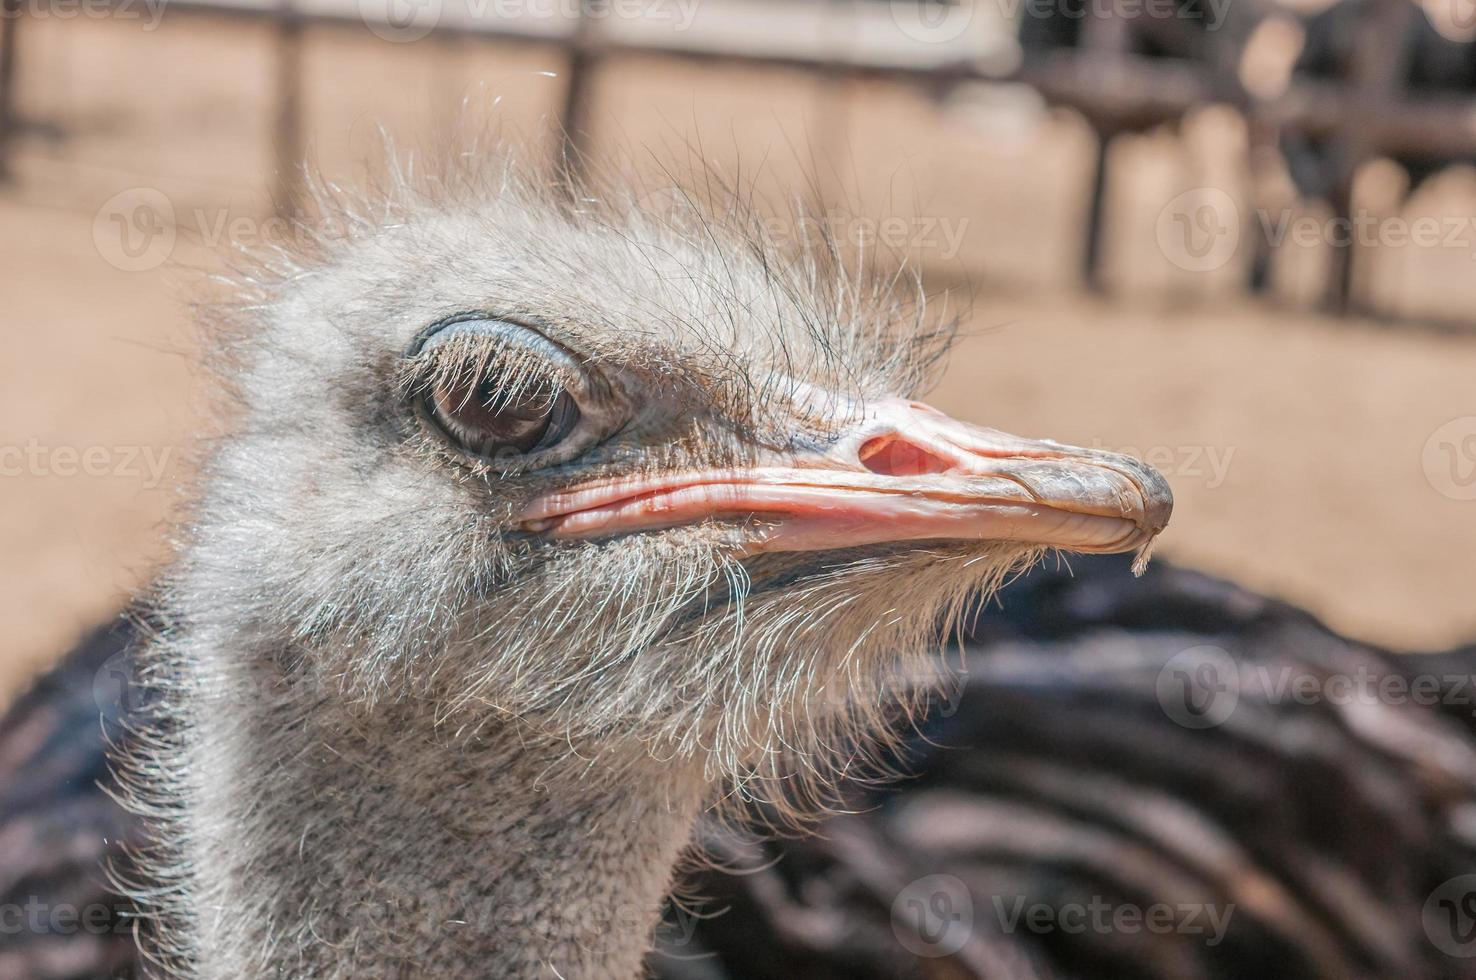 cara de avestruz foto